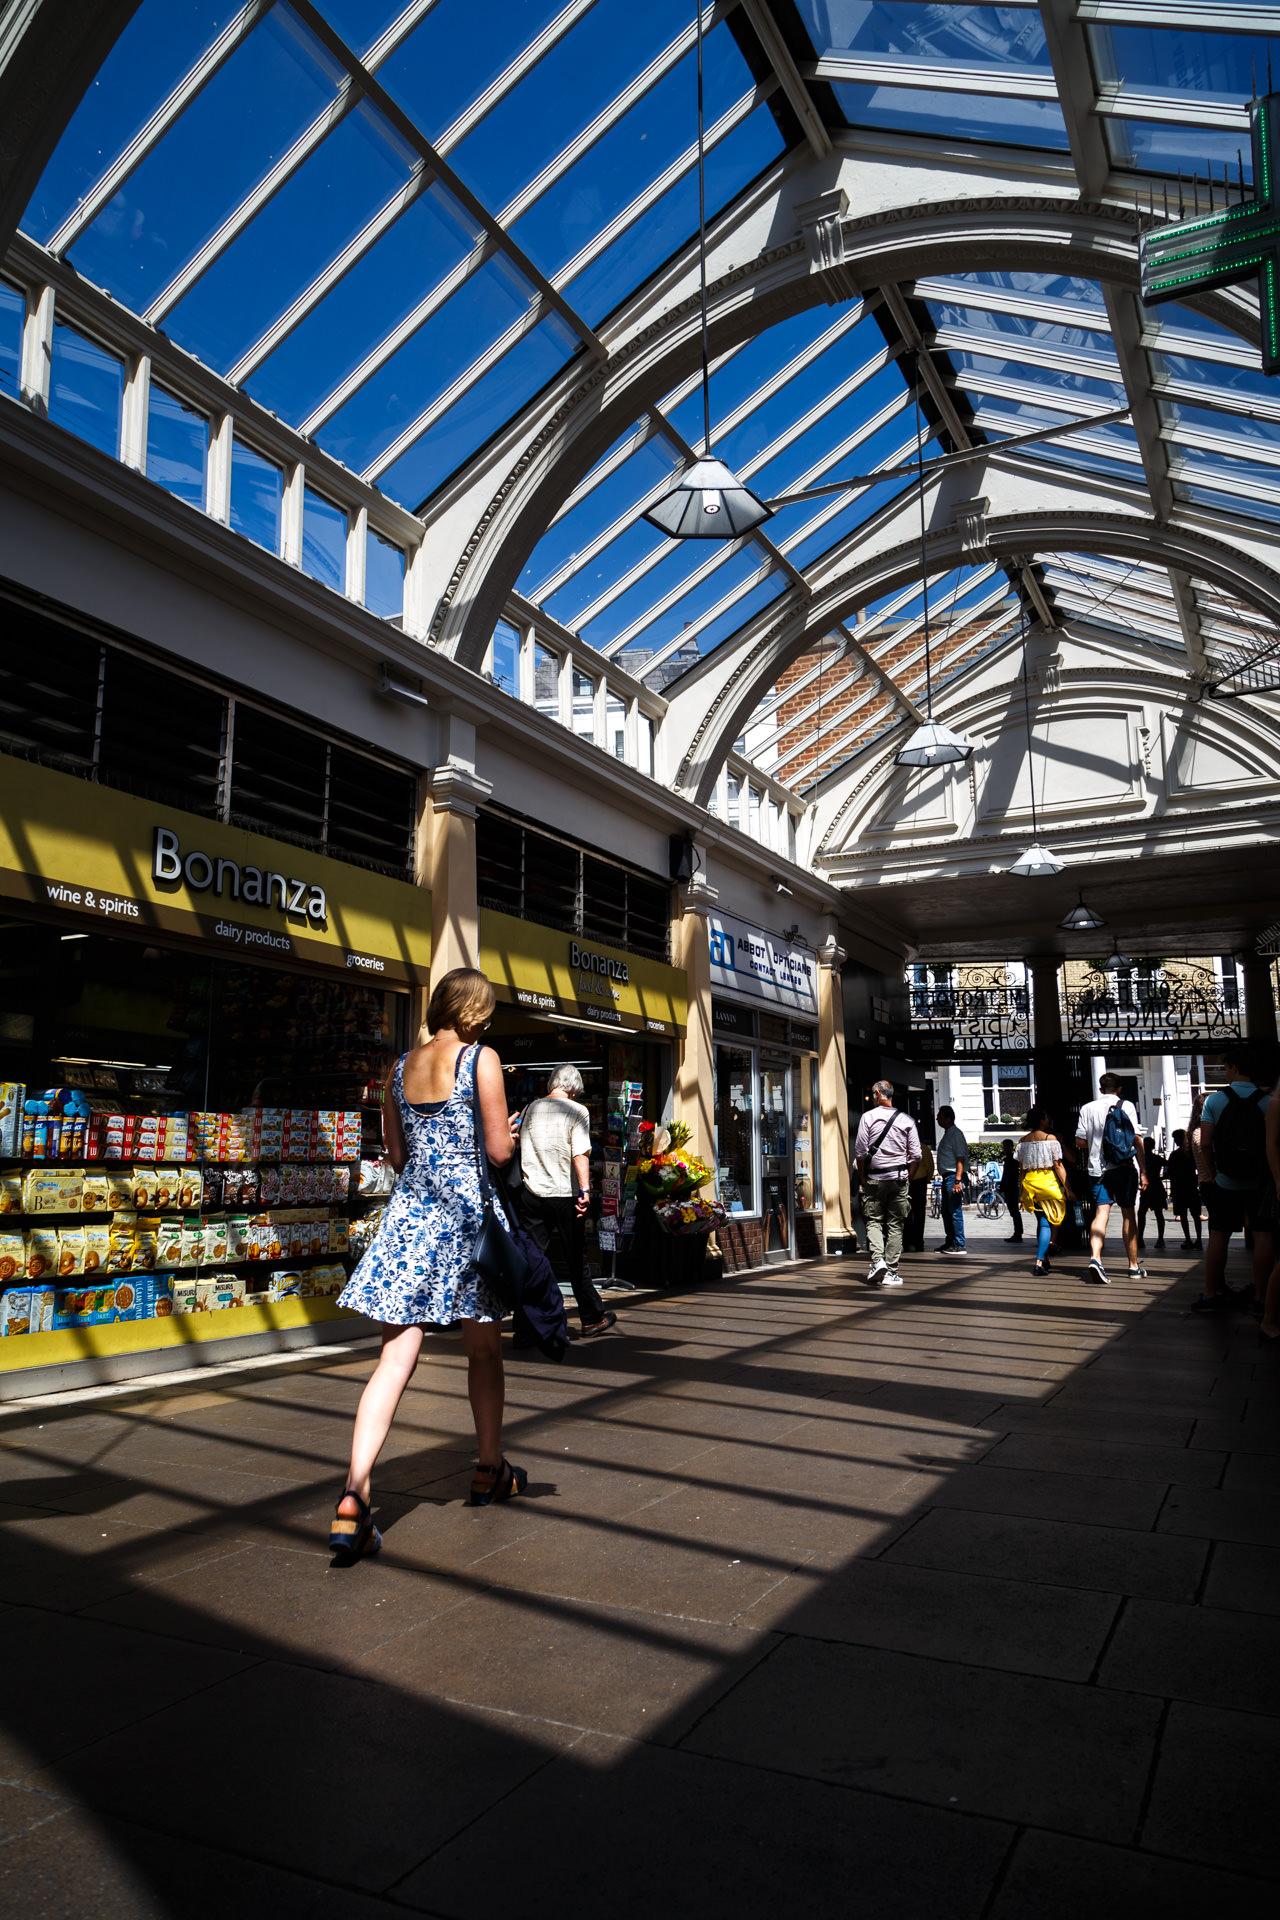 South Kensington Station.